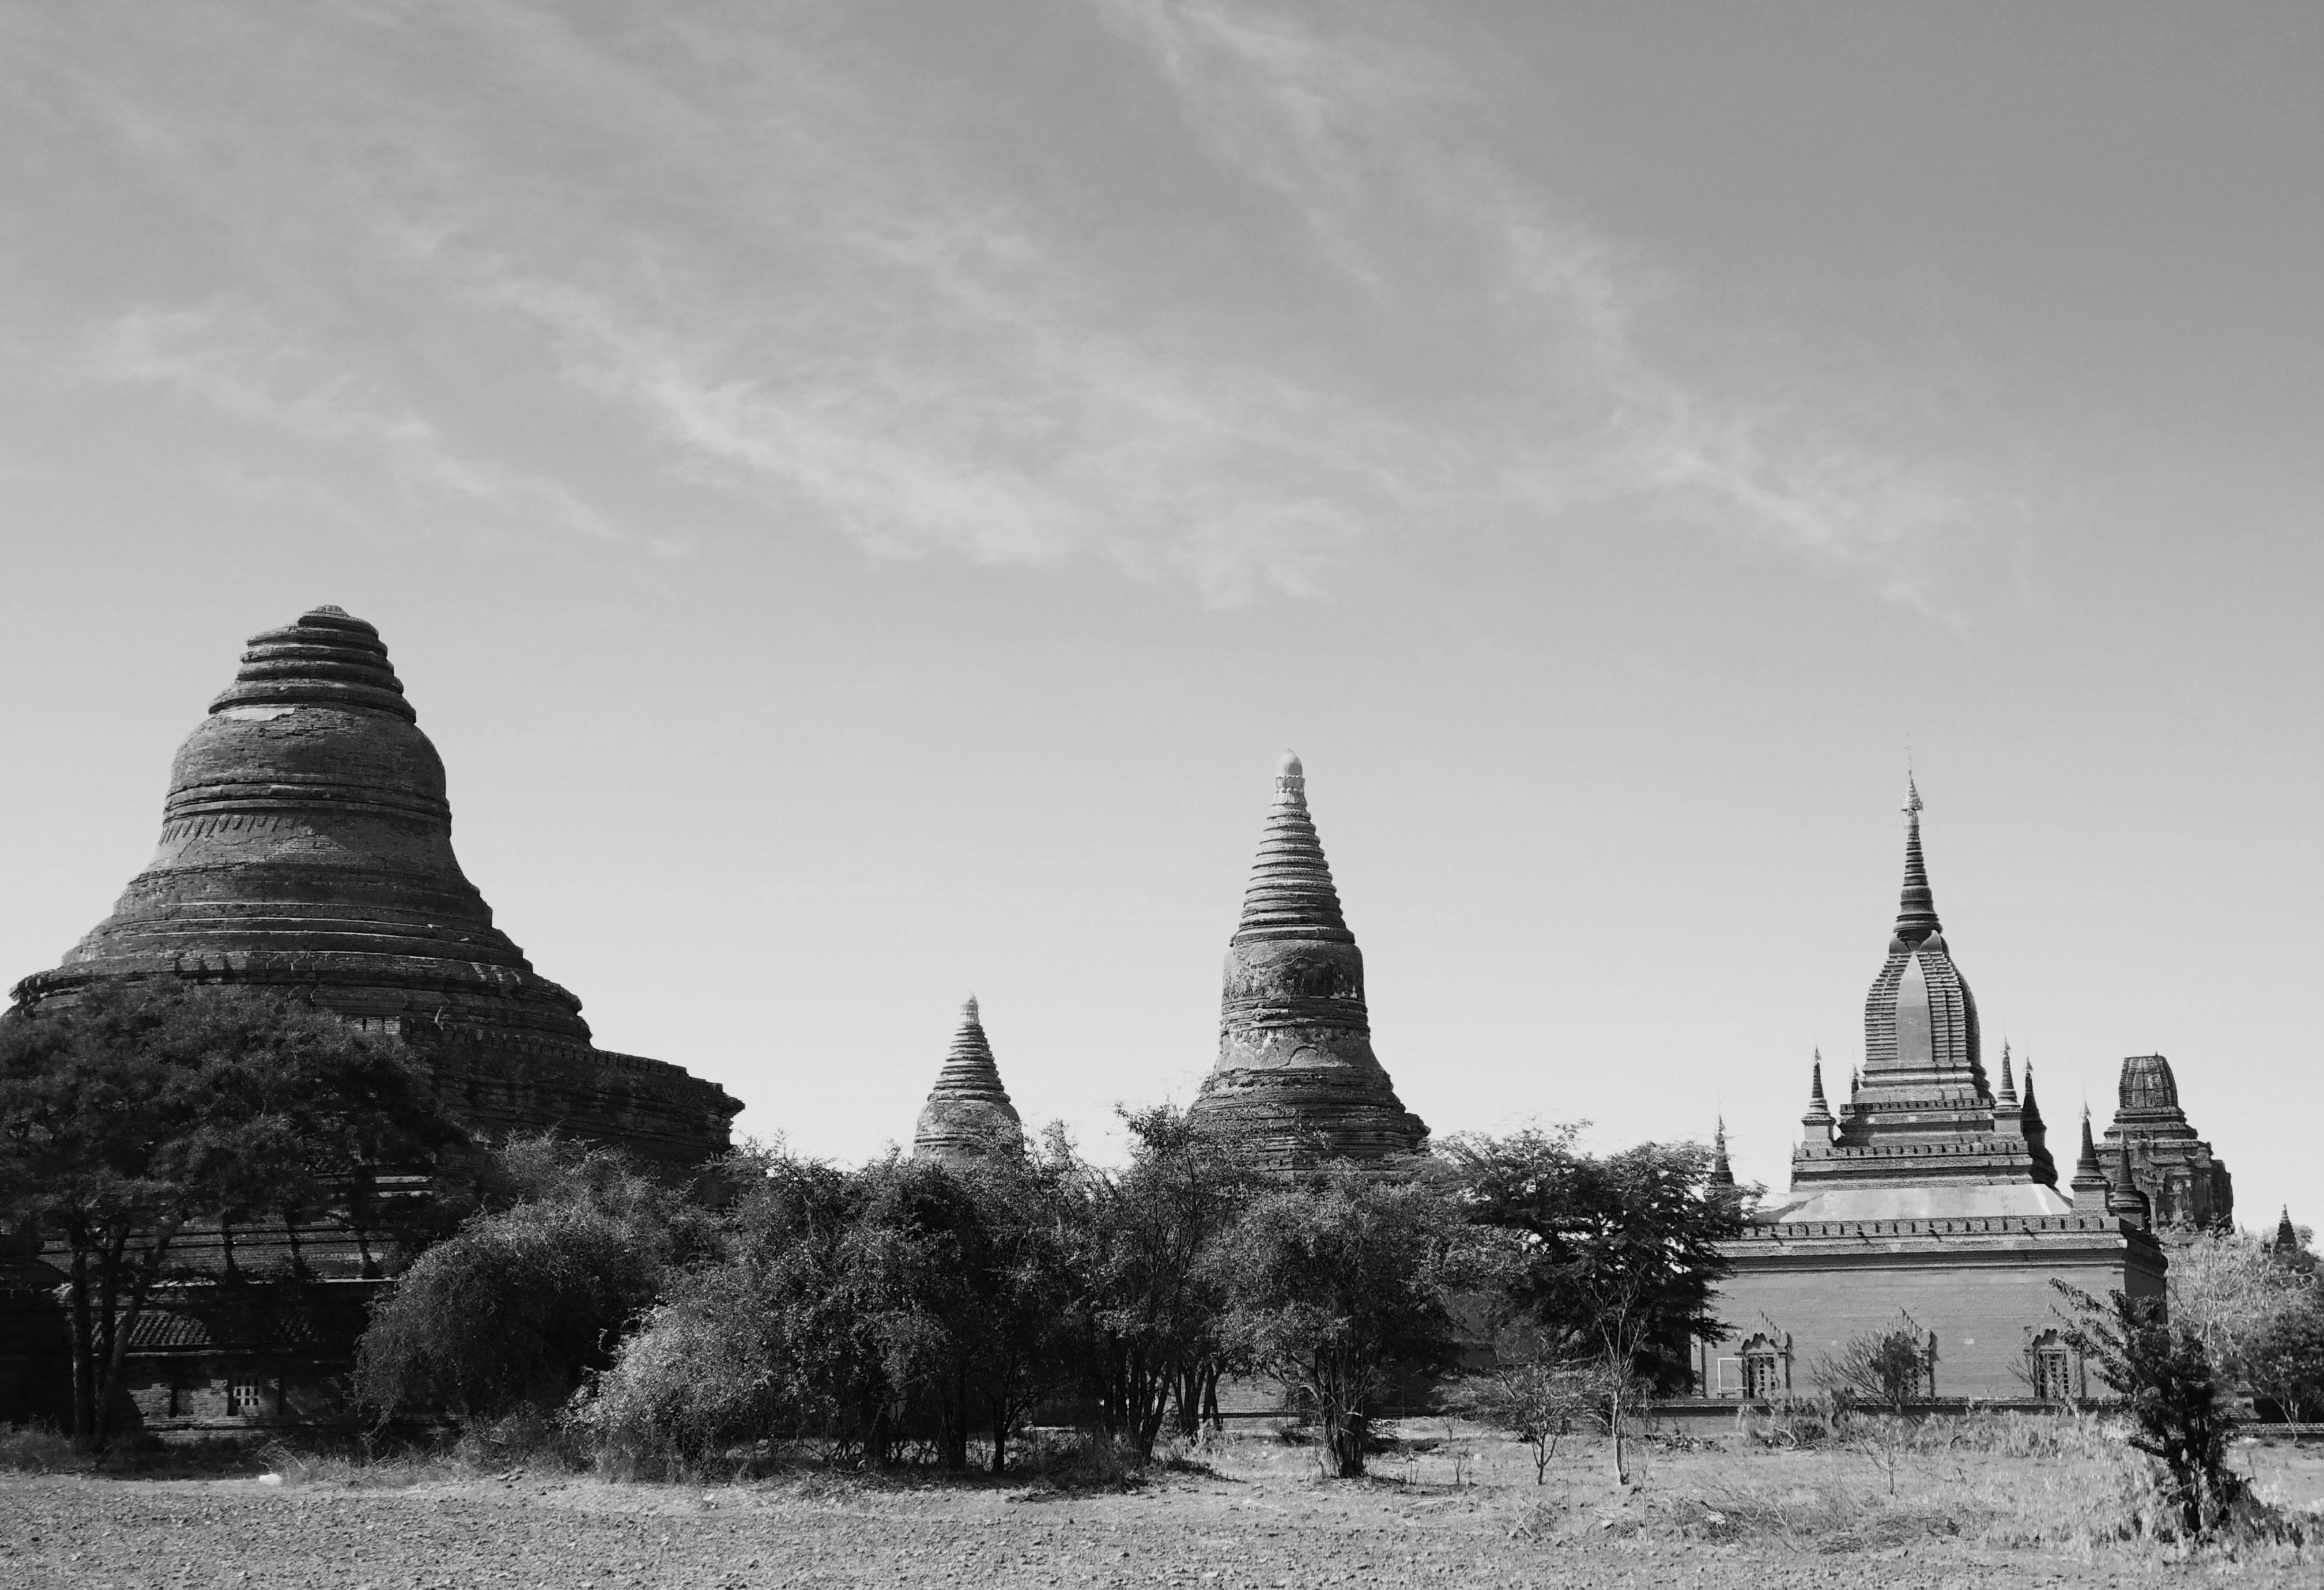 Bagan Temples and Pagodas